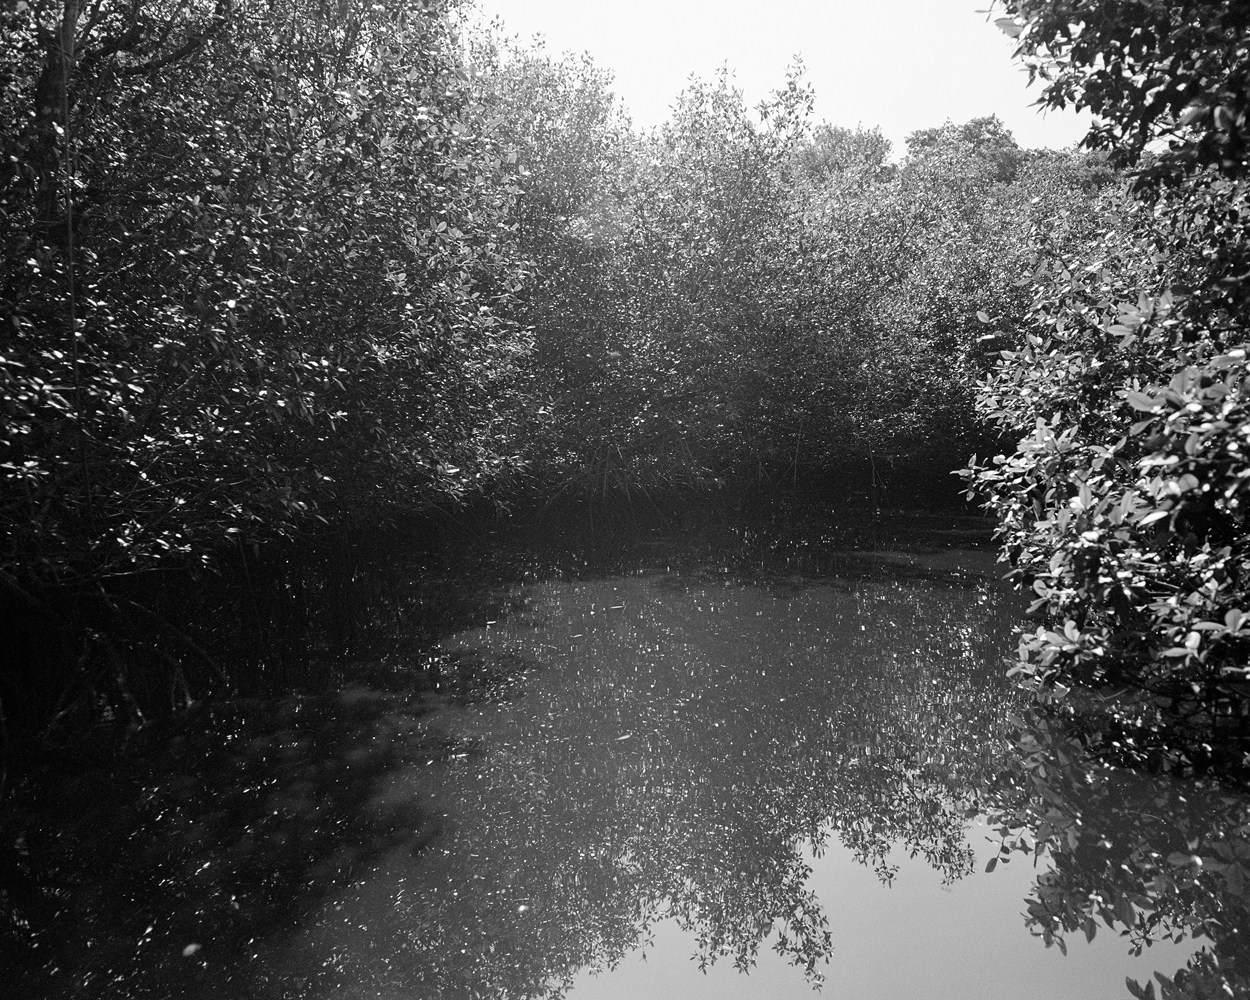 Belanger_Turner River_2002.jpg